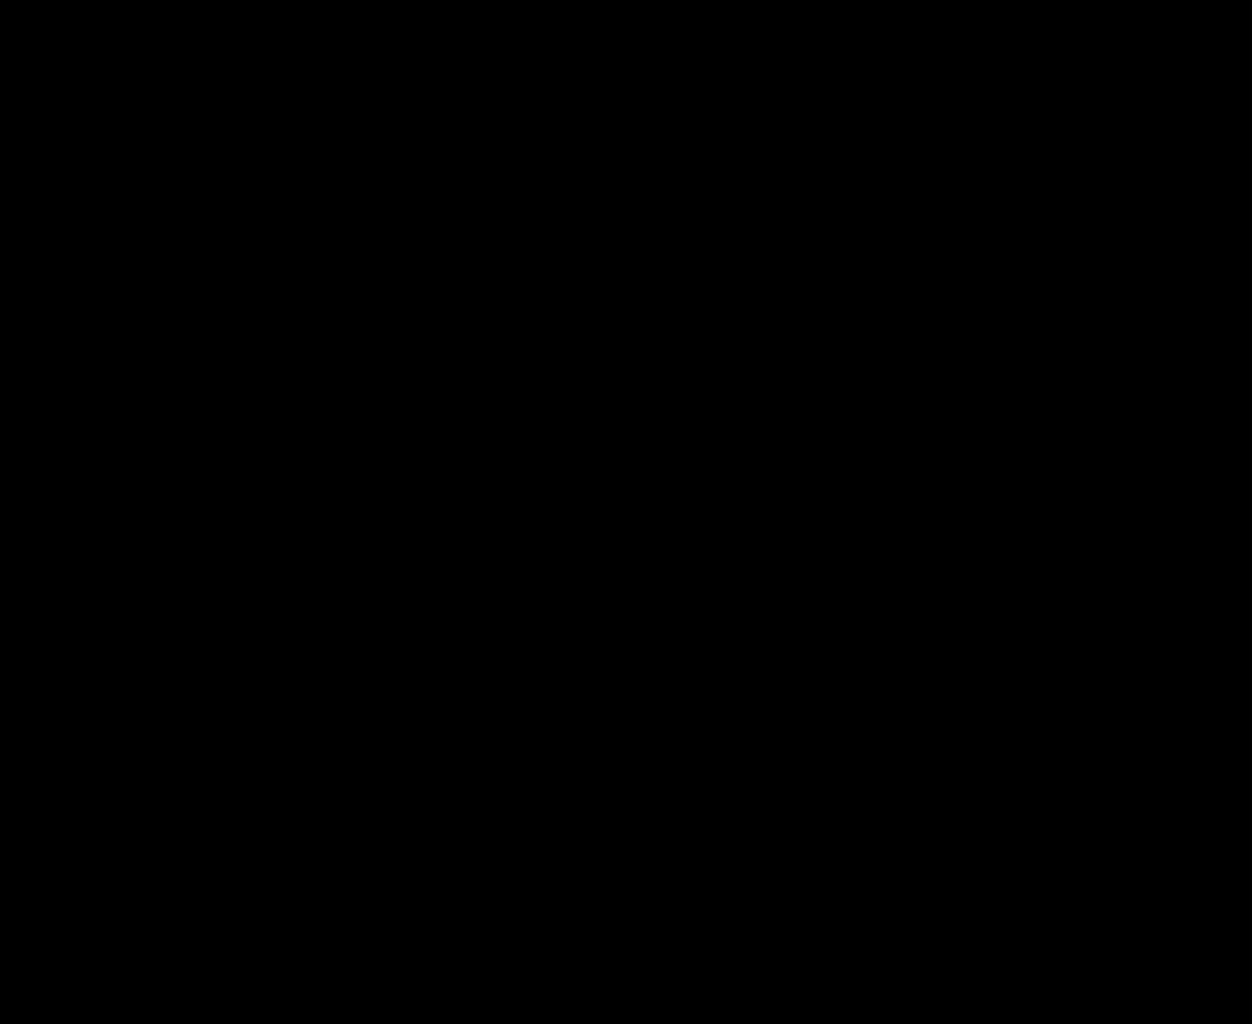 Logo retailer Etos